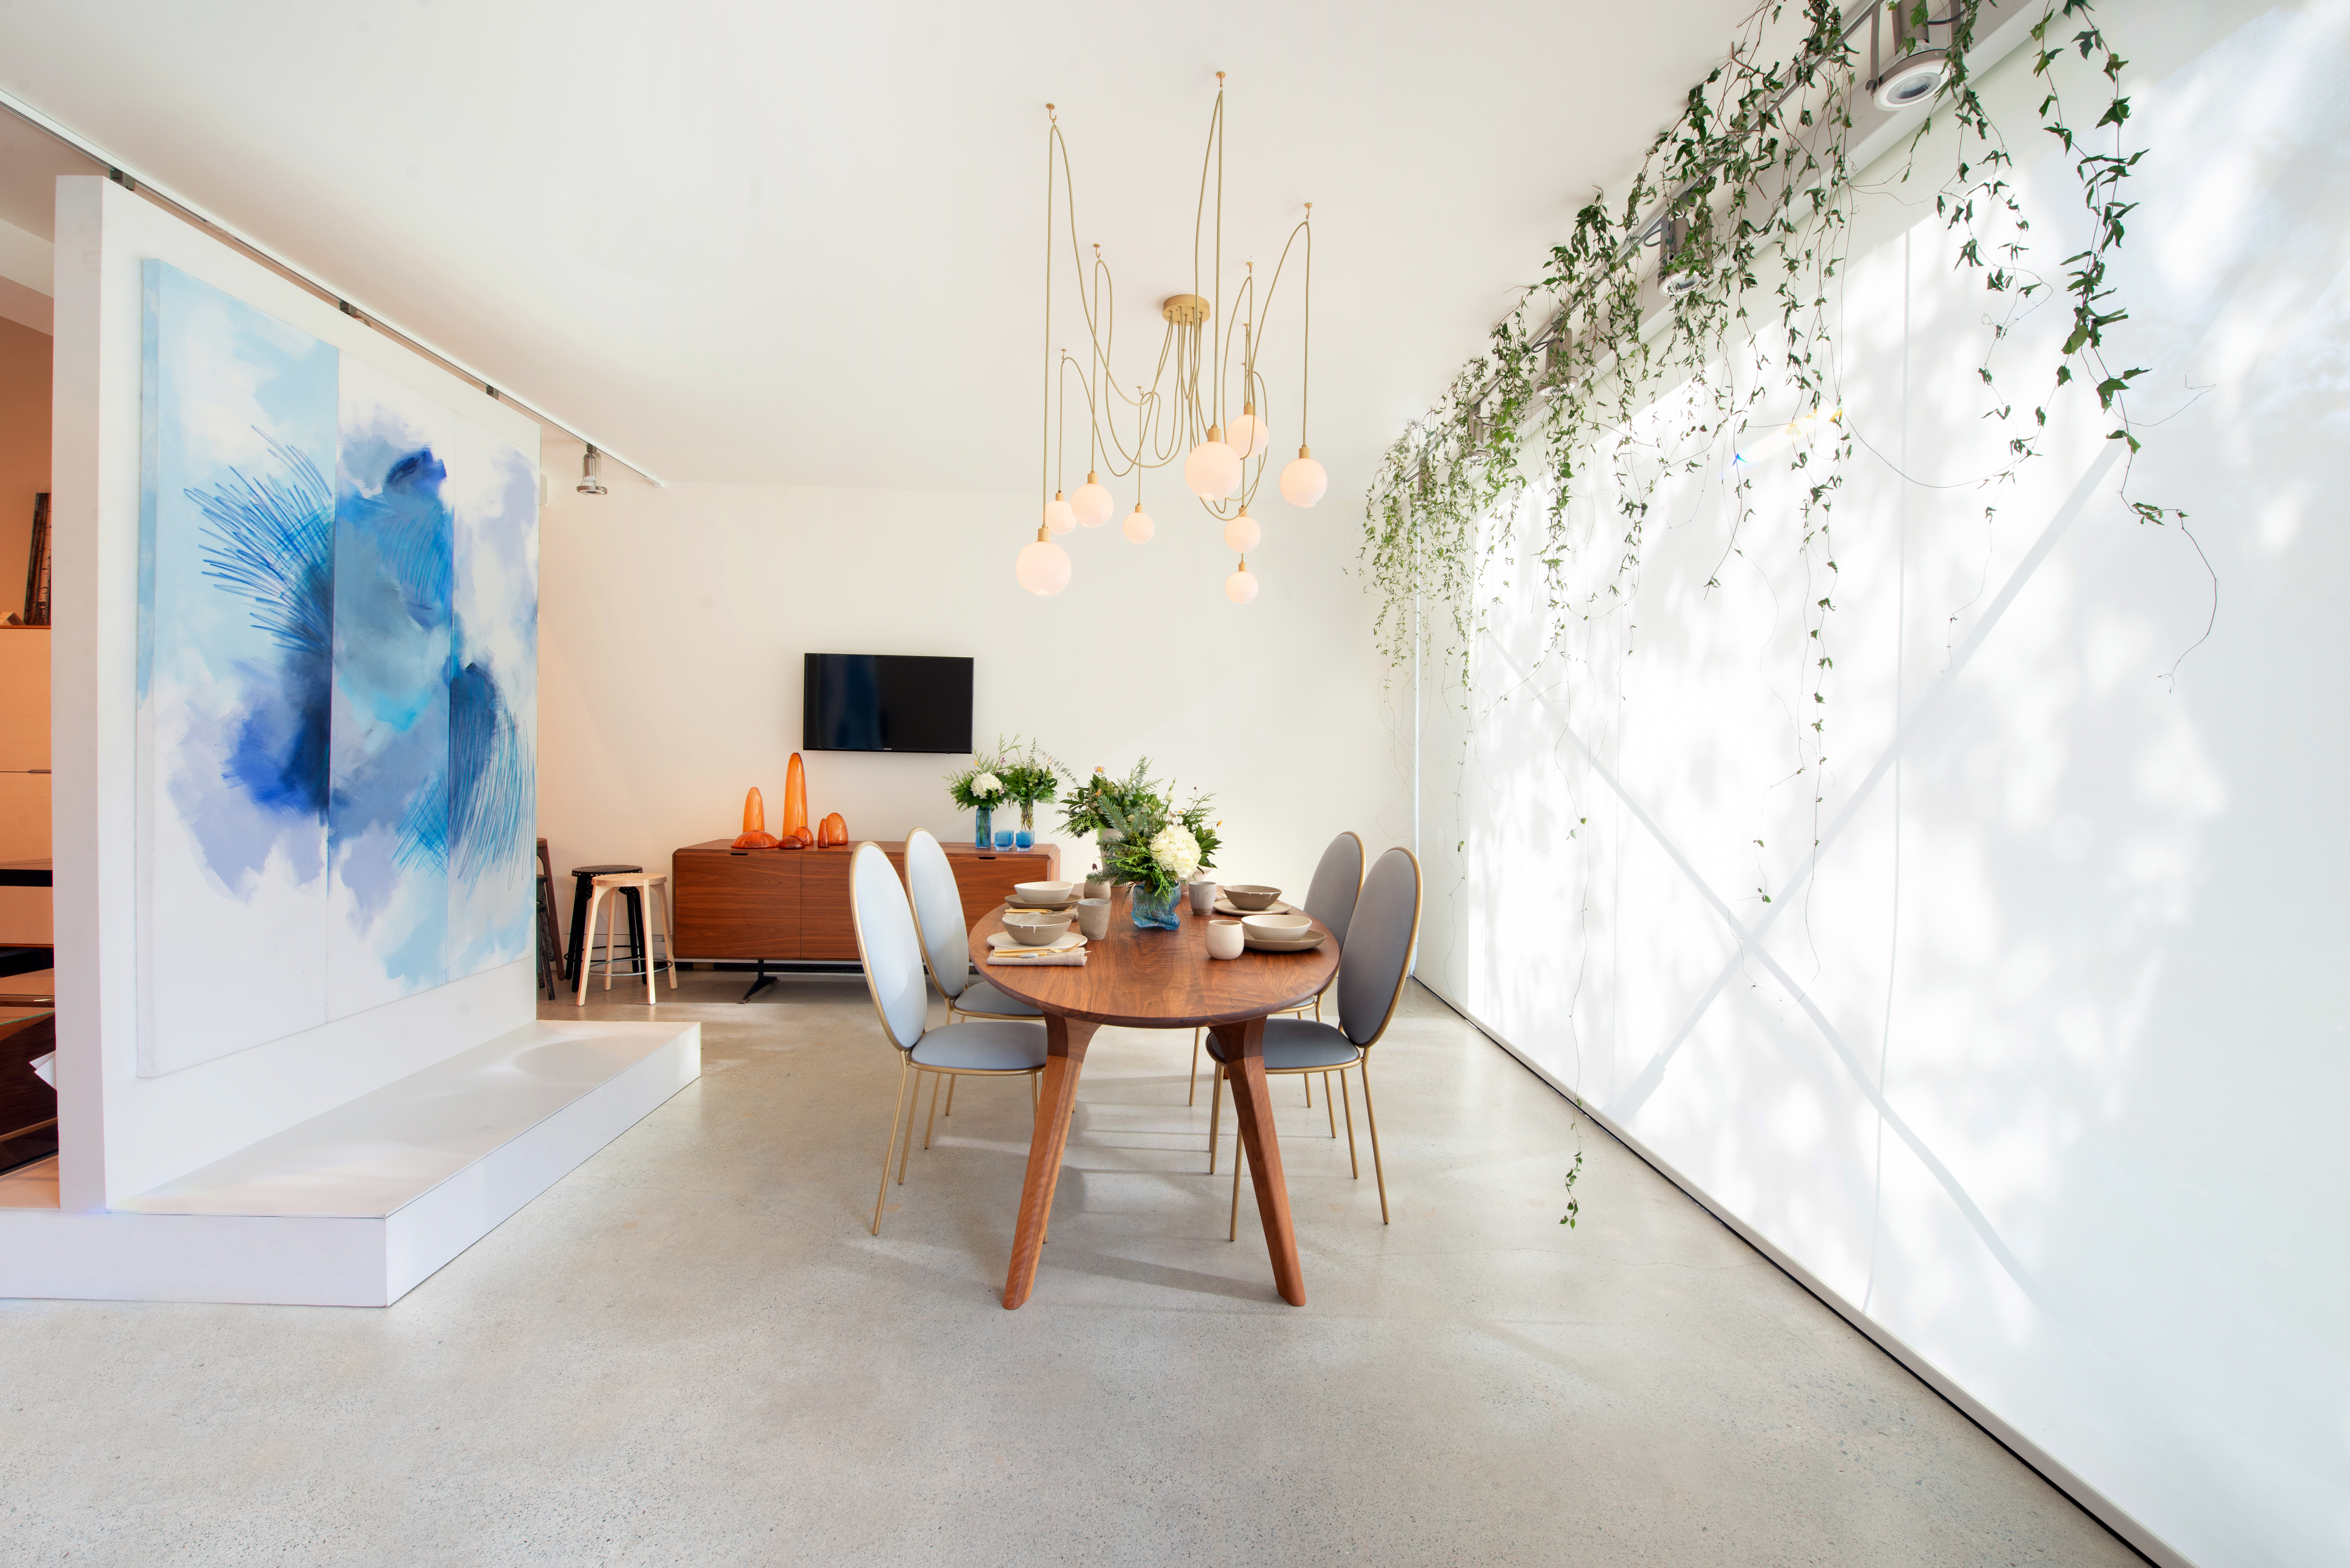 M&M_S15E12_Karla Dreyer_Dining Room Vignette